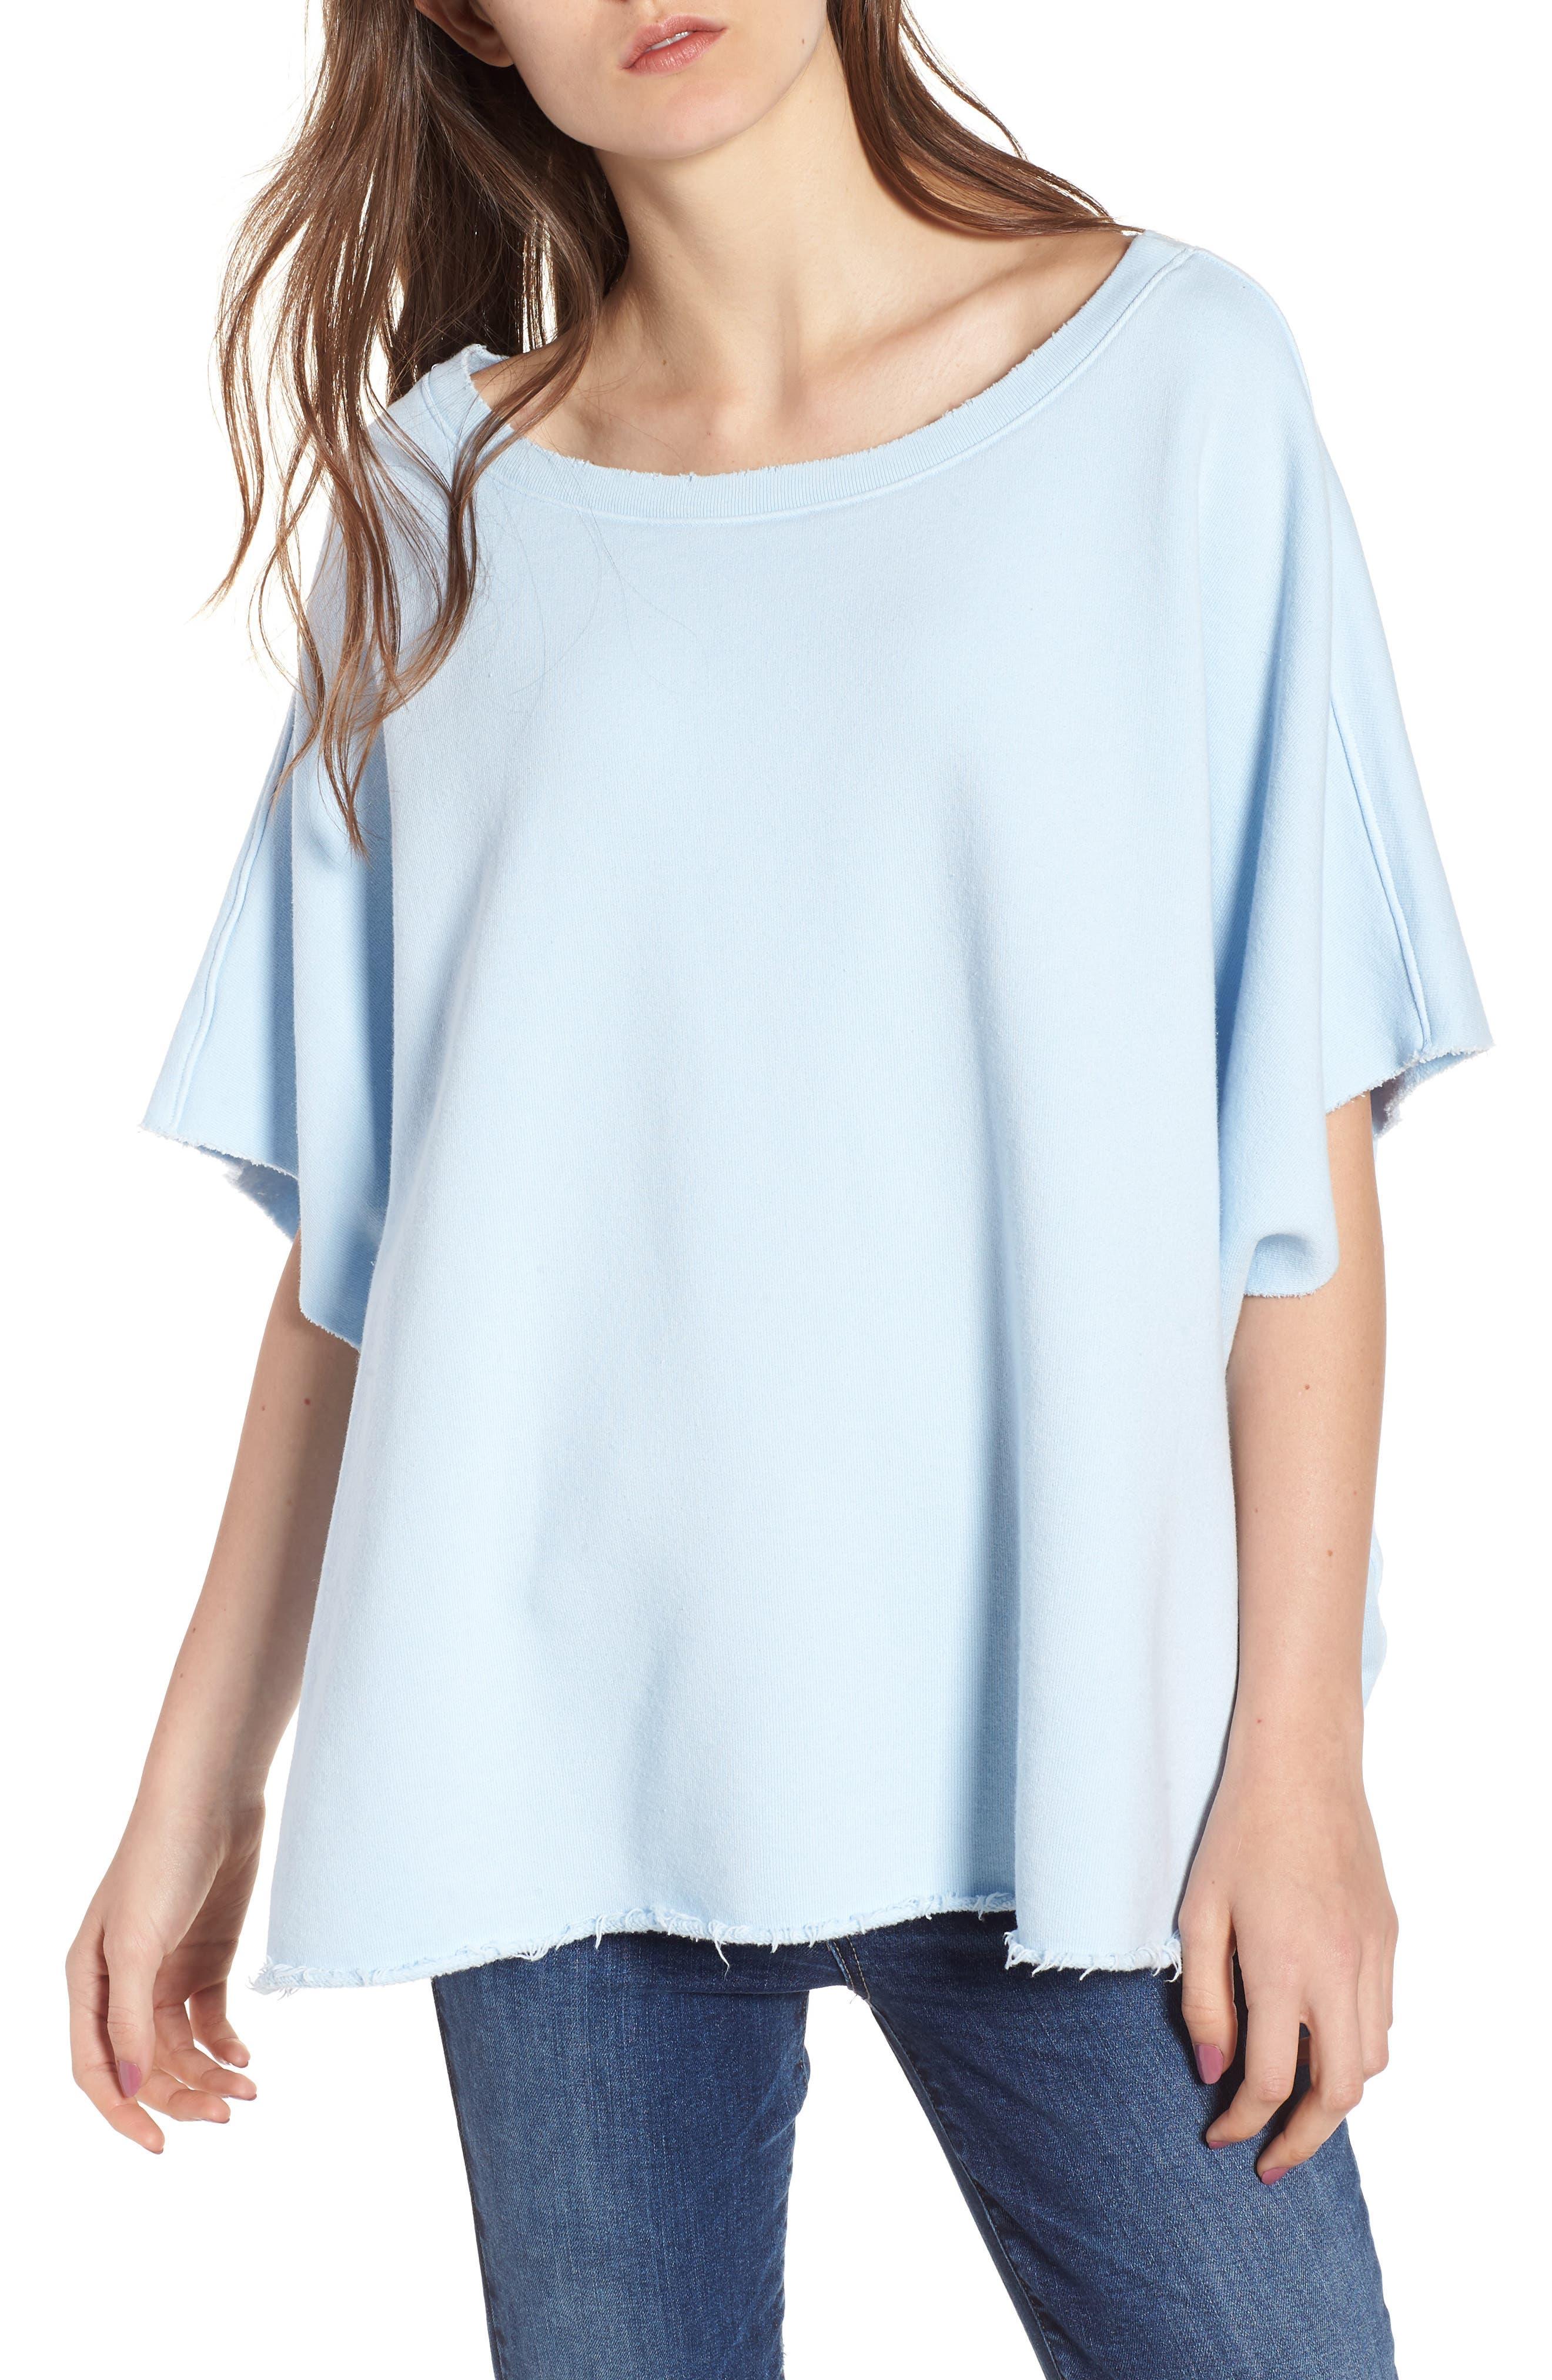 Capelet Sweatshirt,                         Main,                         color, Maliblue